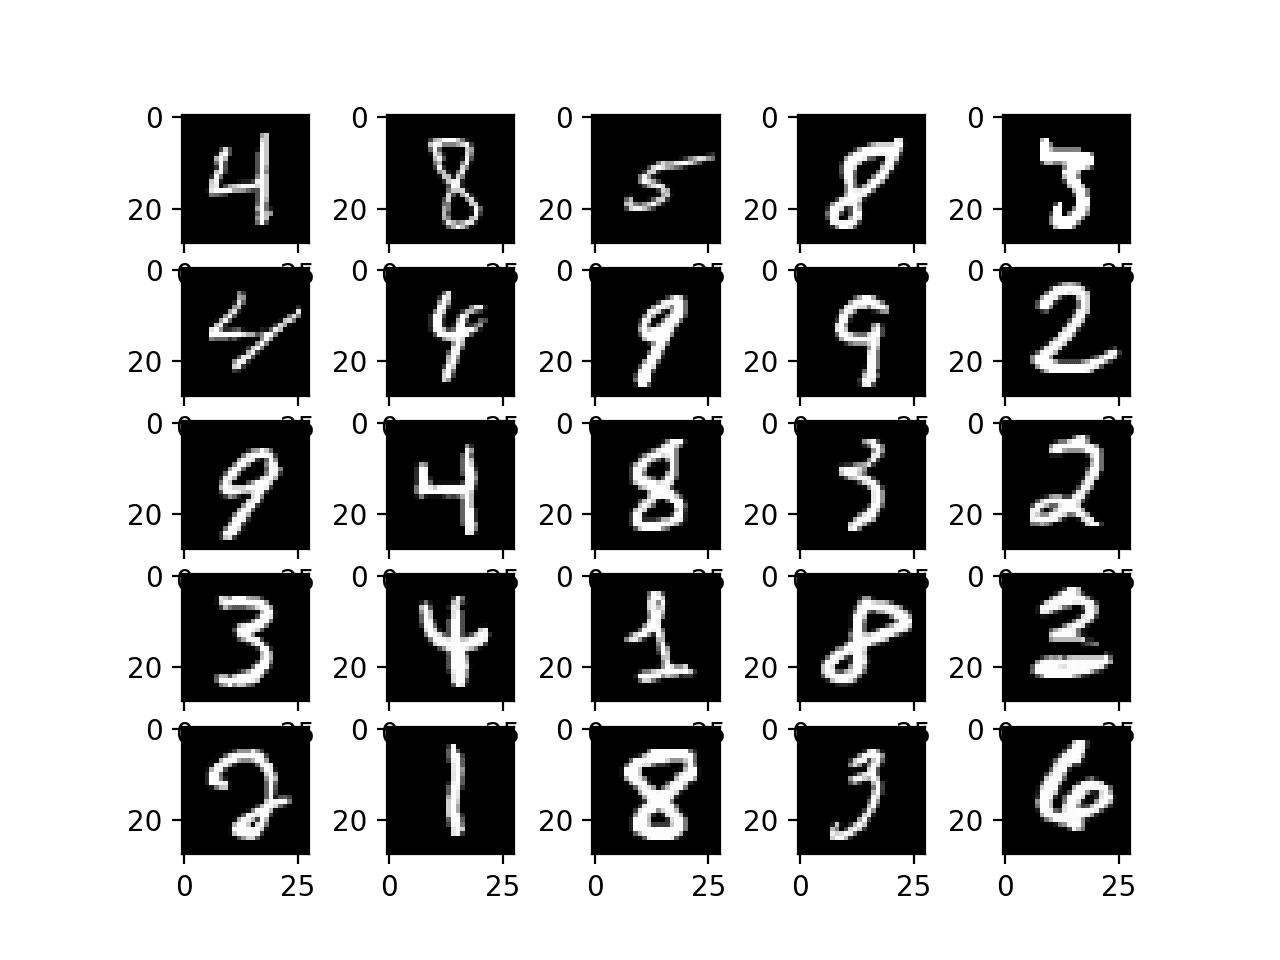 Plot of Handwritten Digits From the MNIST dataset